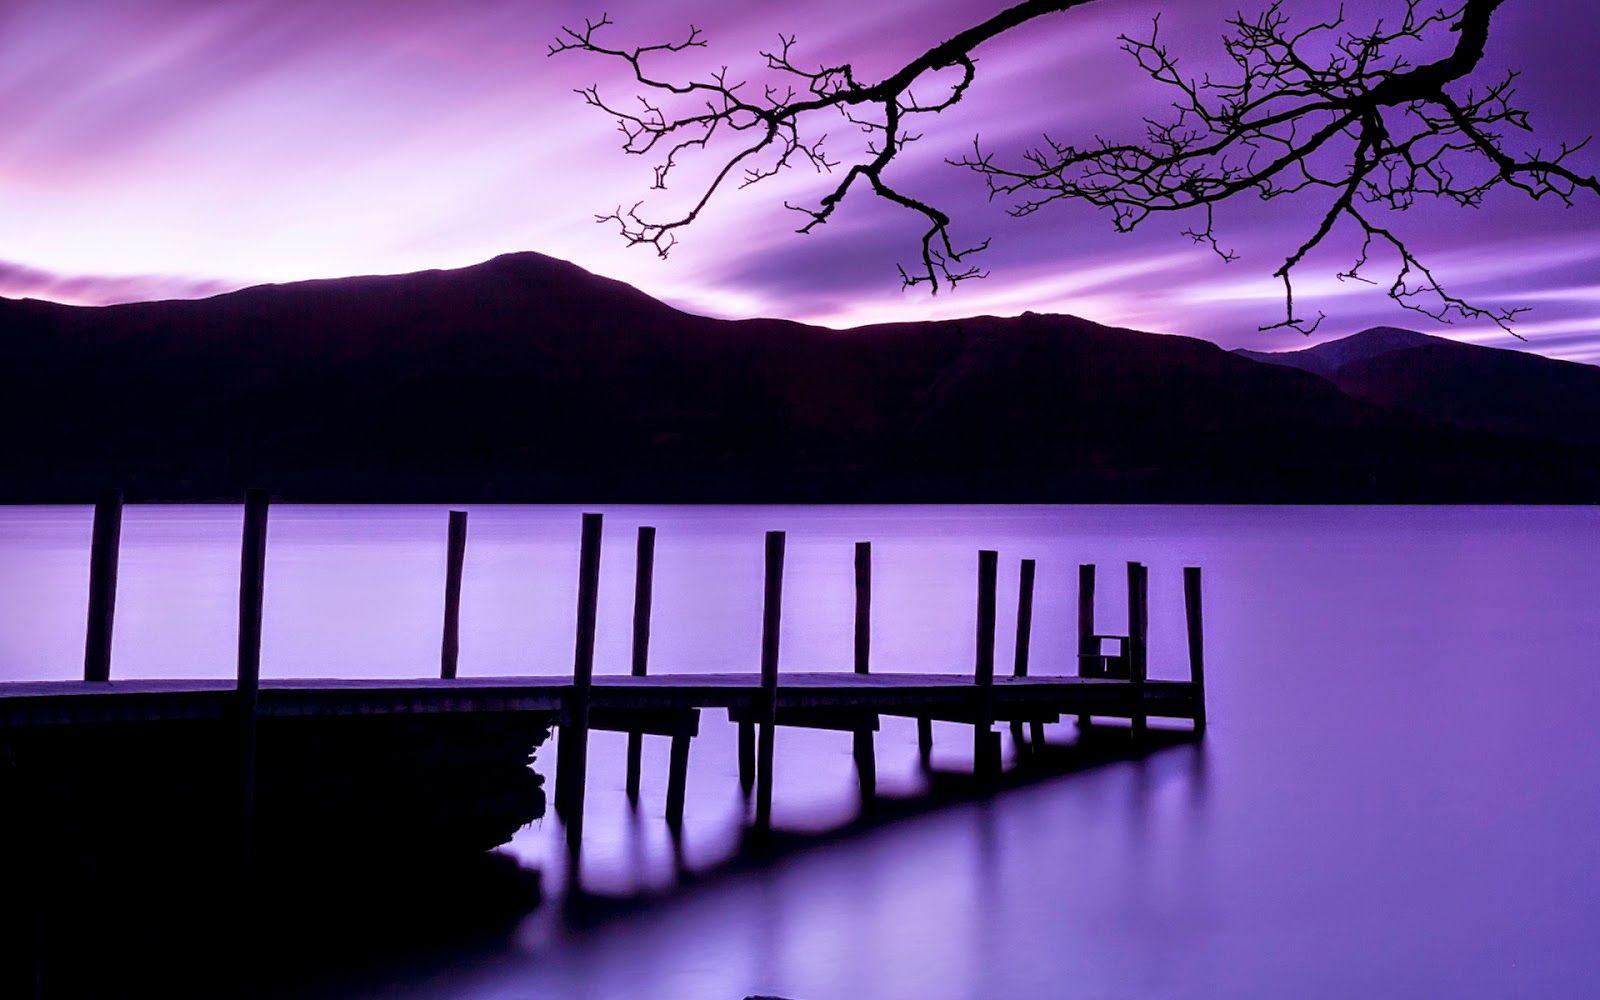 Purple World Hd Wallpaper 1080p Desktop Background Nature Nature Wallpaper Nature Backgrounds